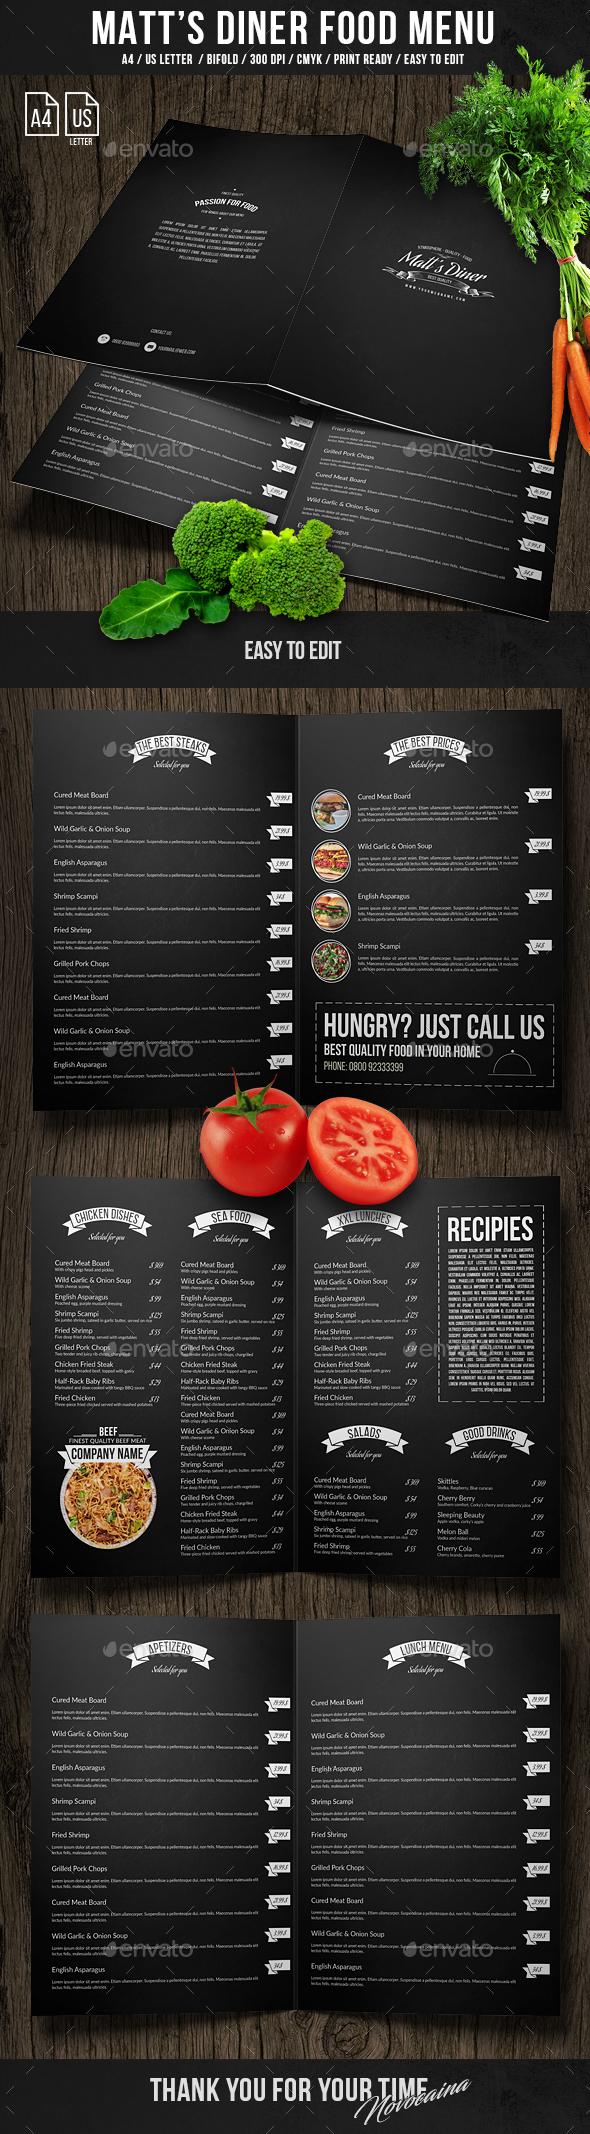 Matt's Diner Bifold Menu A4 and US Letter - Food Menus Print Templates